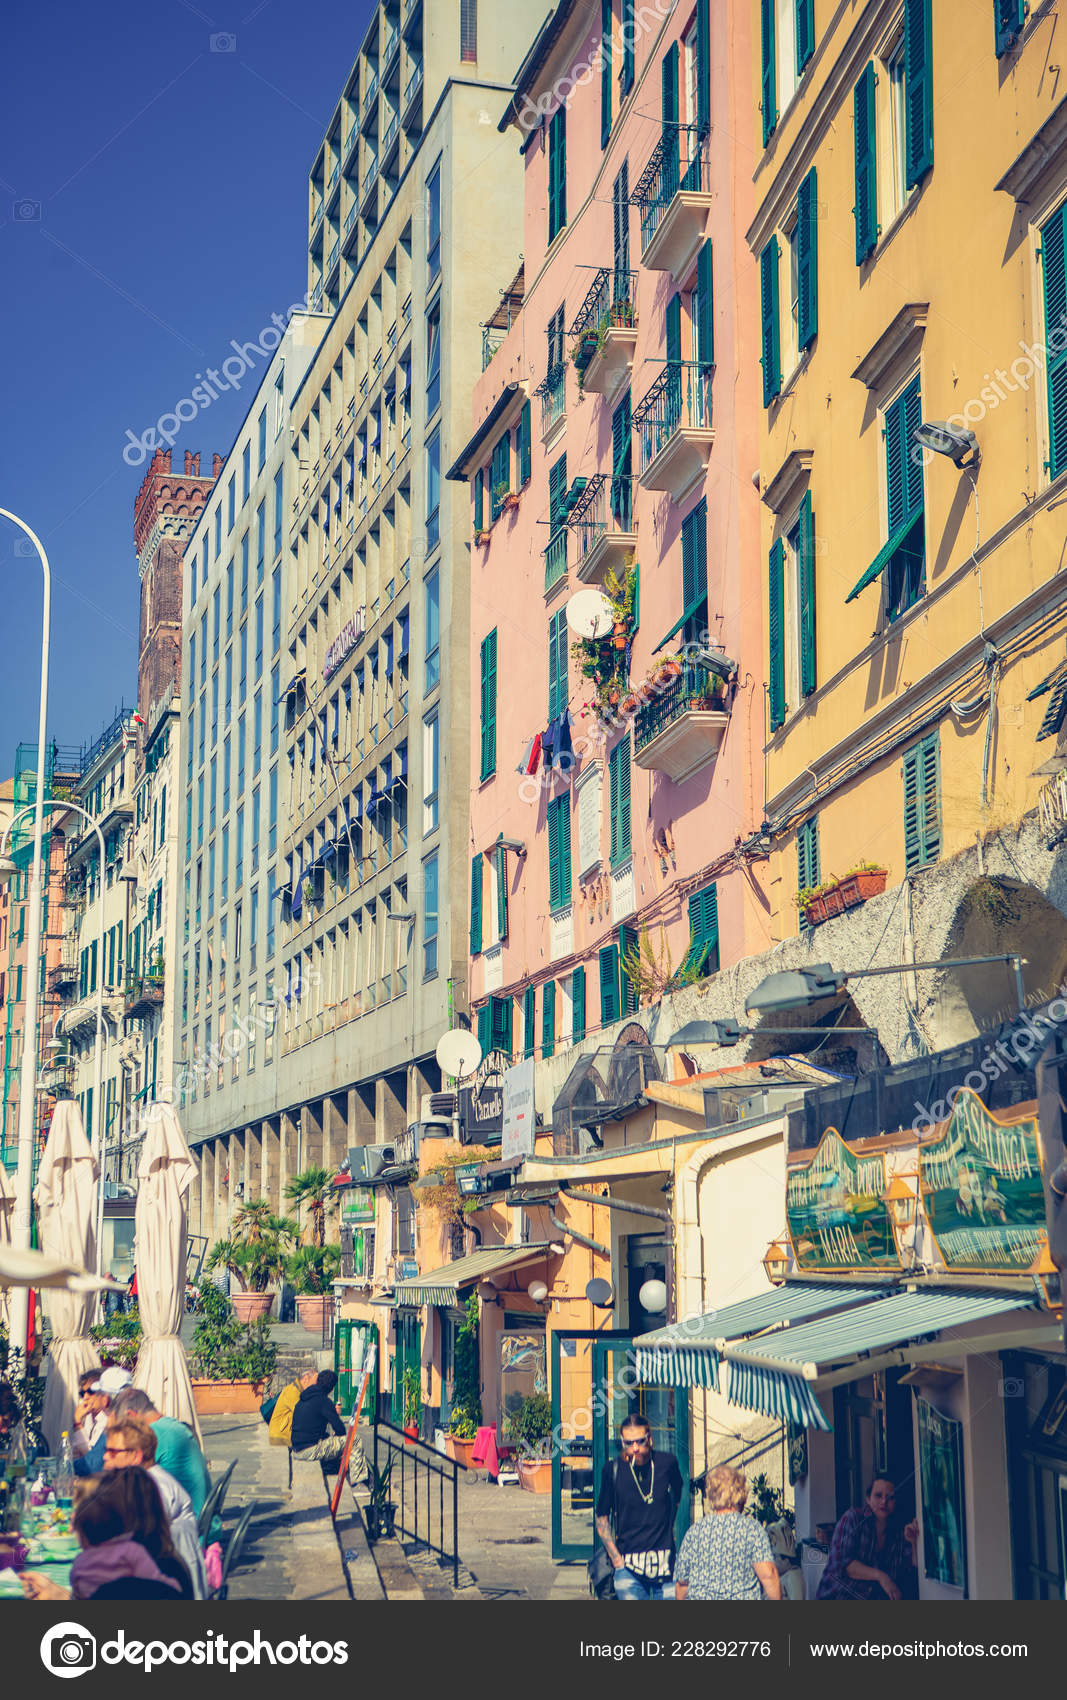 Genova Italy October 2018 Italian Restaurant Colorful Old Houses